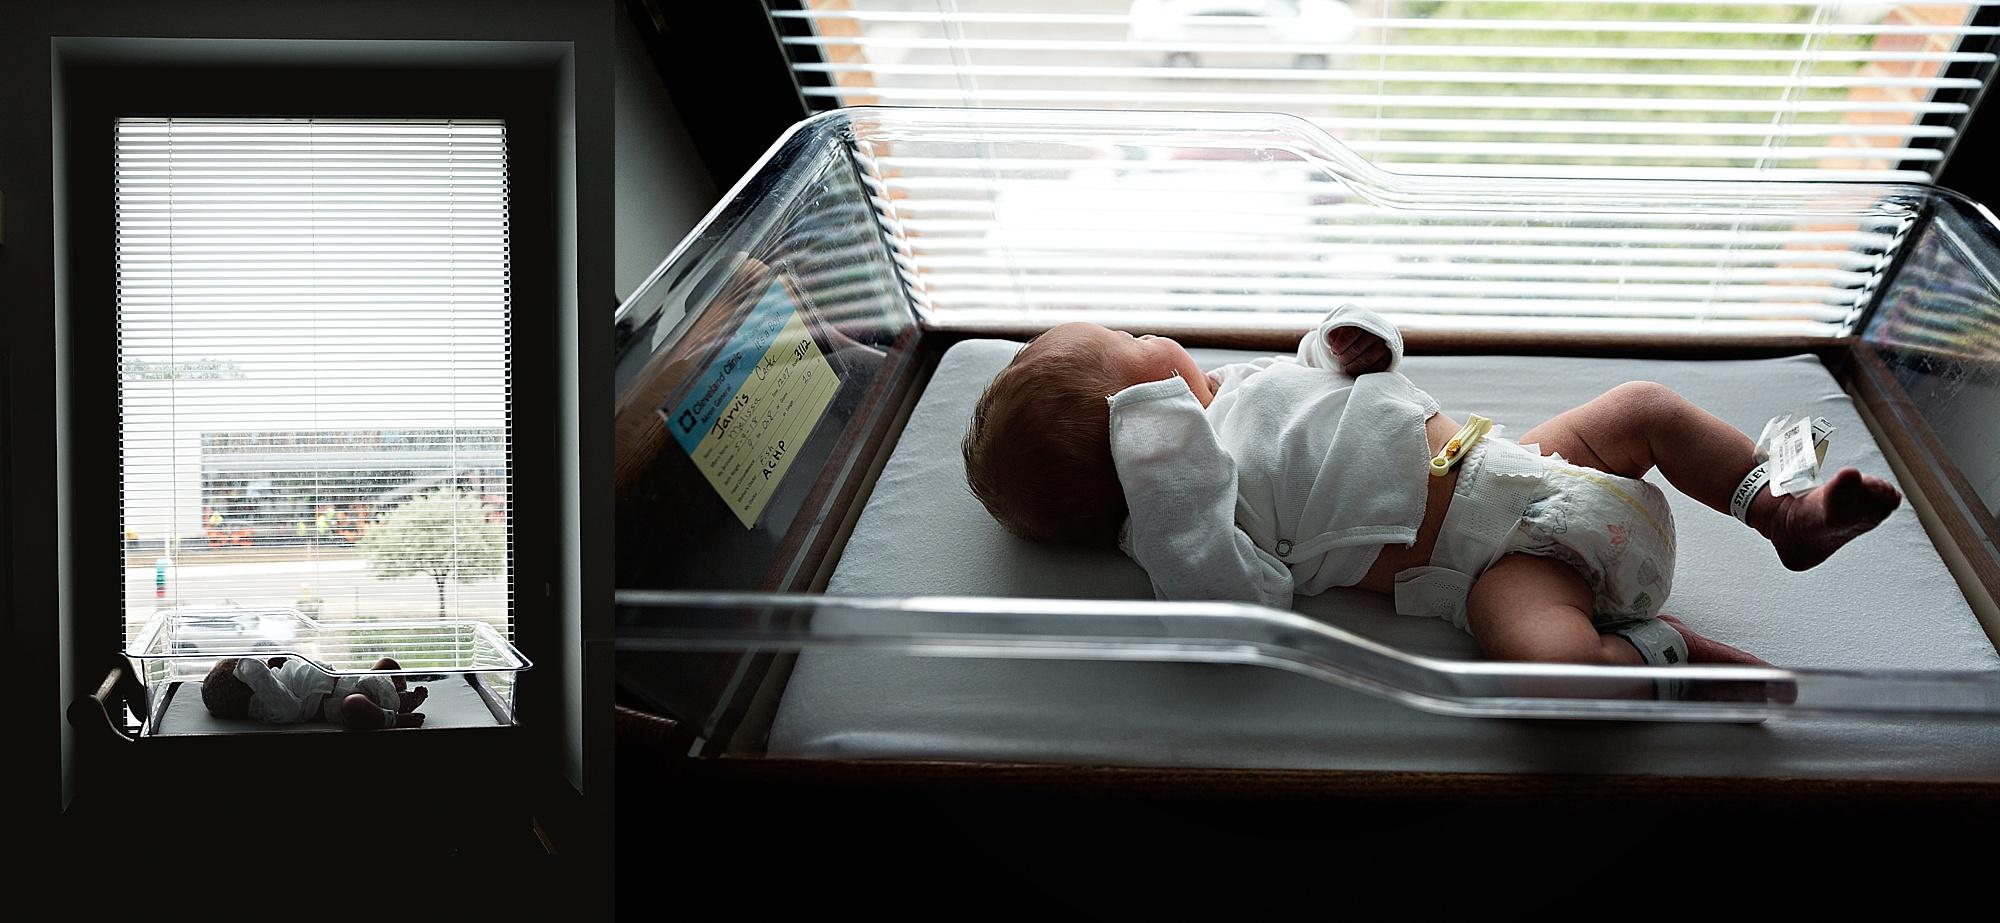 lauren-grayson-photography-akron-ohio-photographer-family-newborn-fresh-48-baby-hospital-photo-shoot-cleveland-clinic-akron-general-carter_0334.jpg